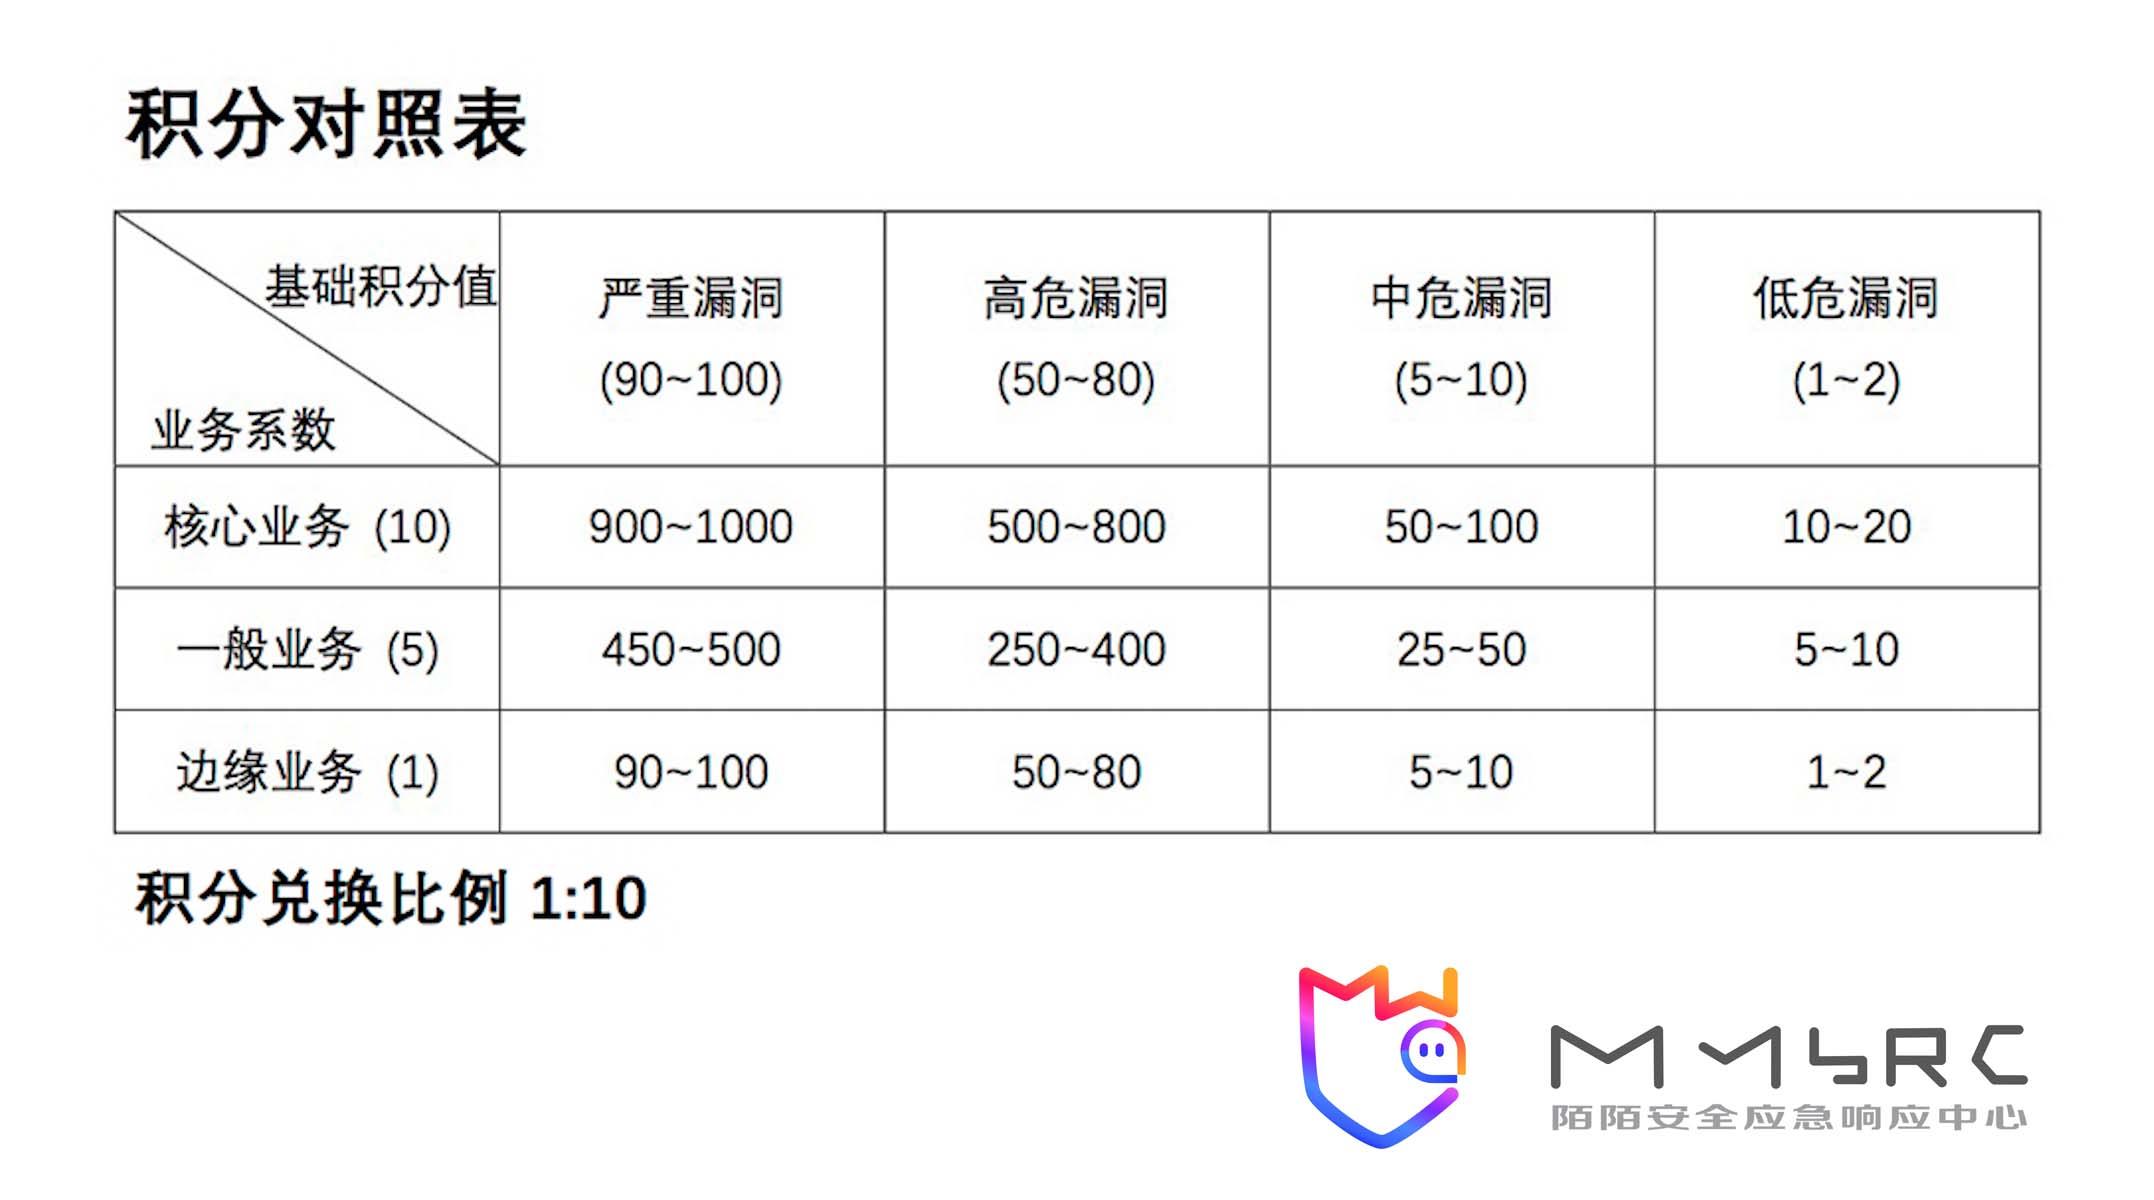 https://momo-mmsrc.oss-cn-hangzhou.aliyuncs.com/img-27ee61f4-3164-3f6e-8f8a-aa5fc8e743ad.jpeg